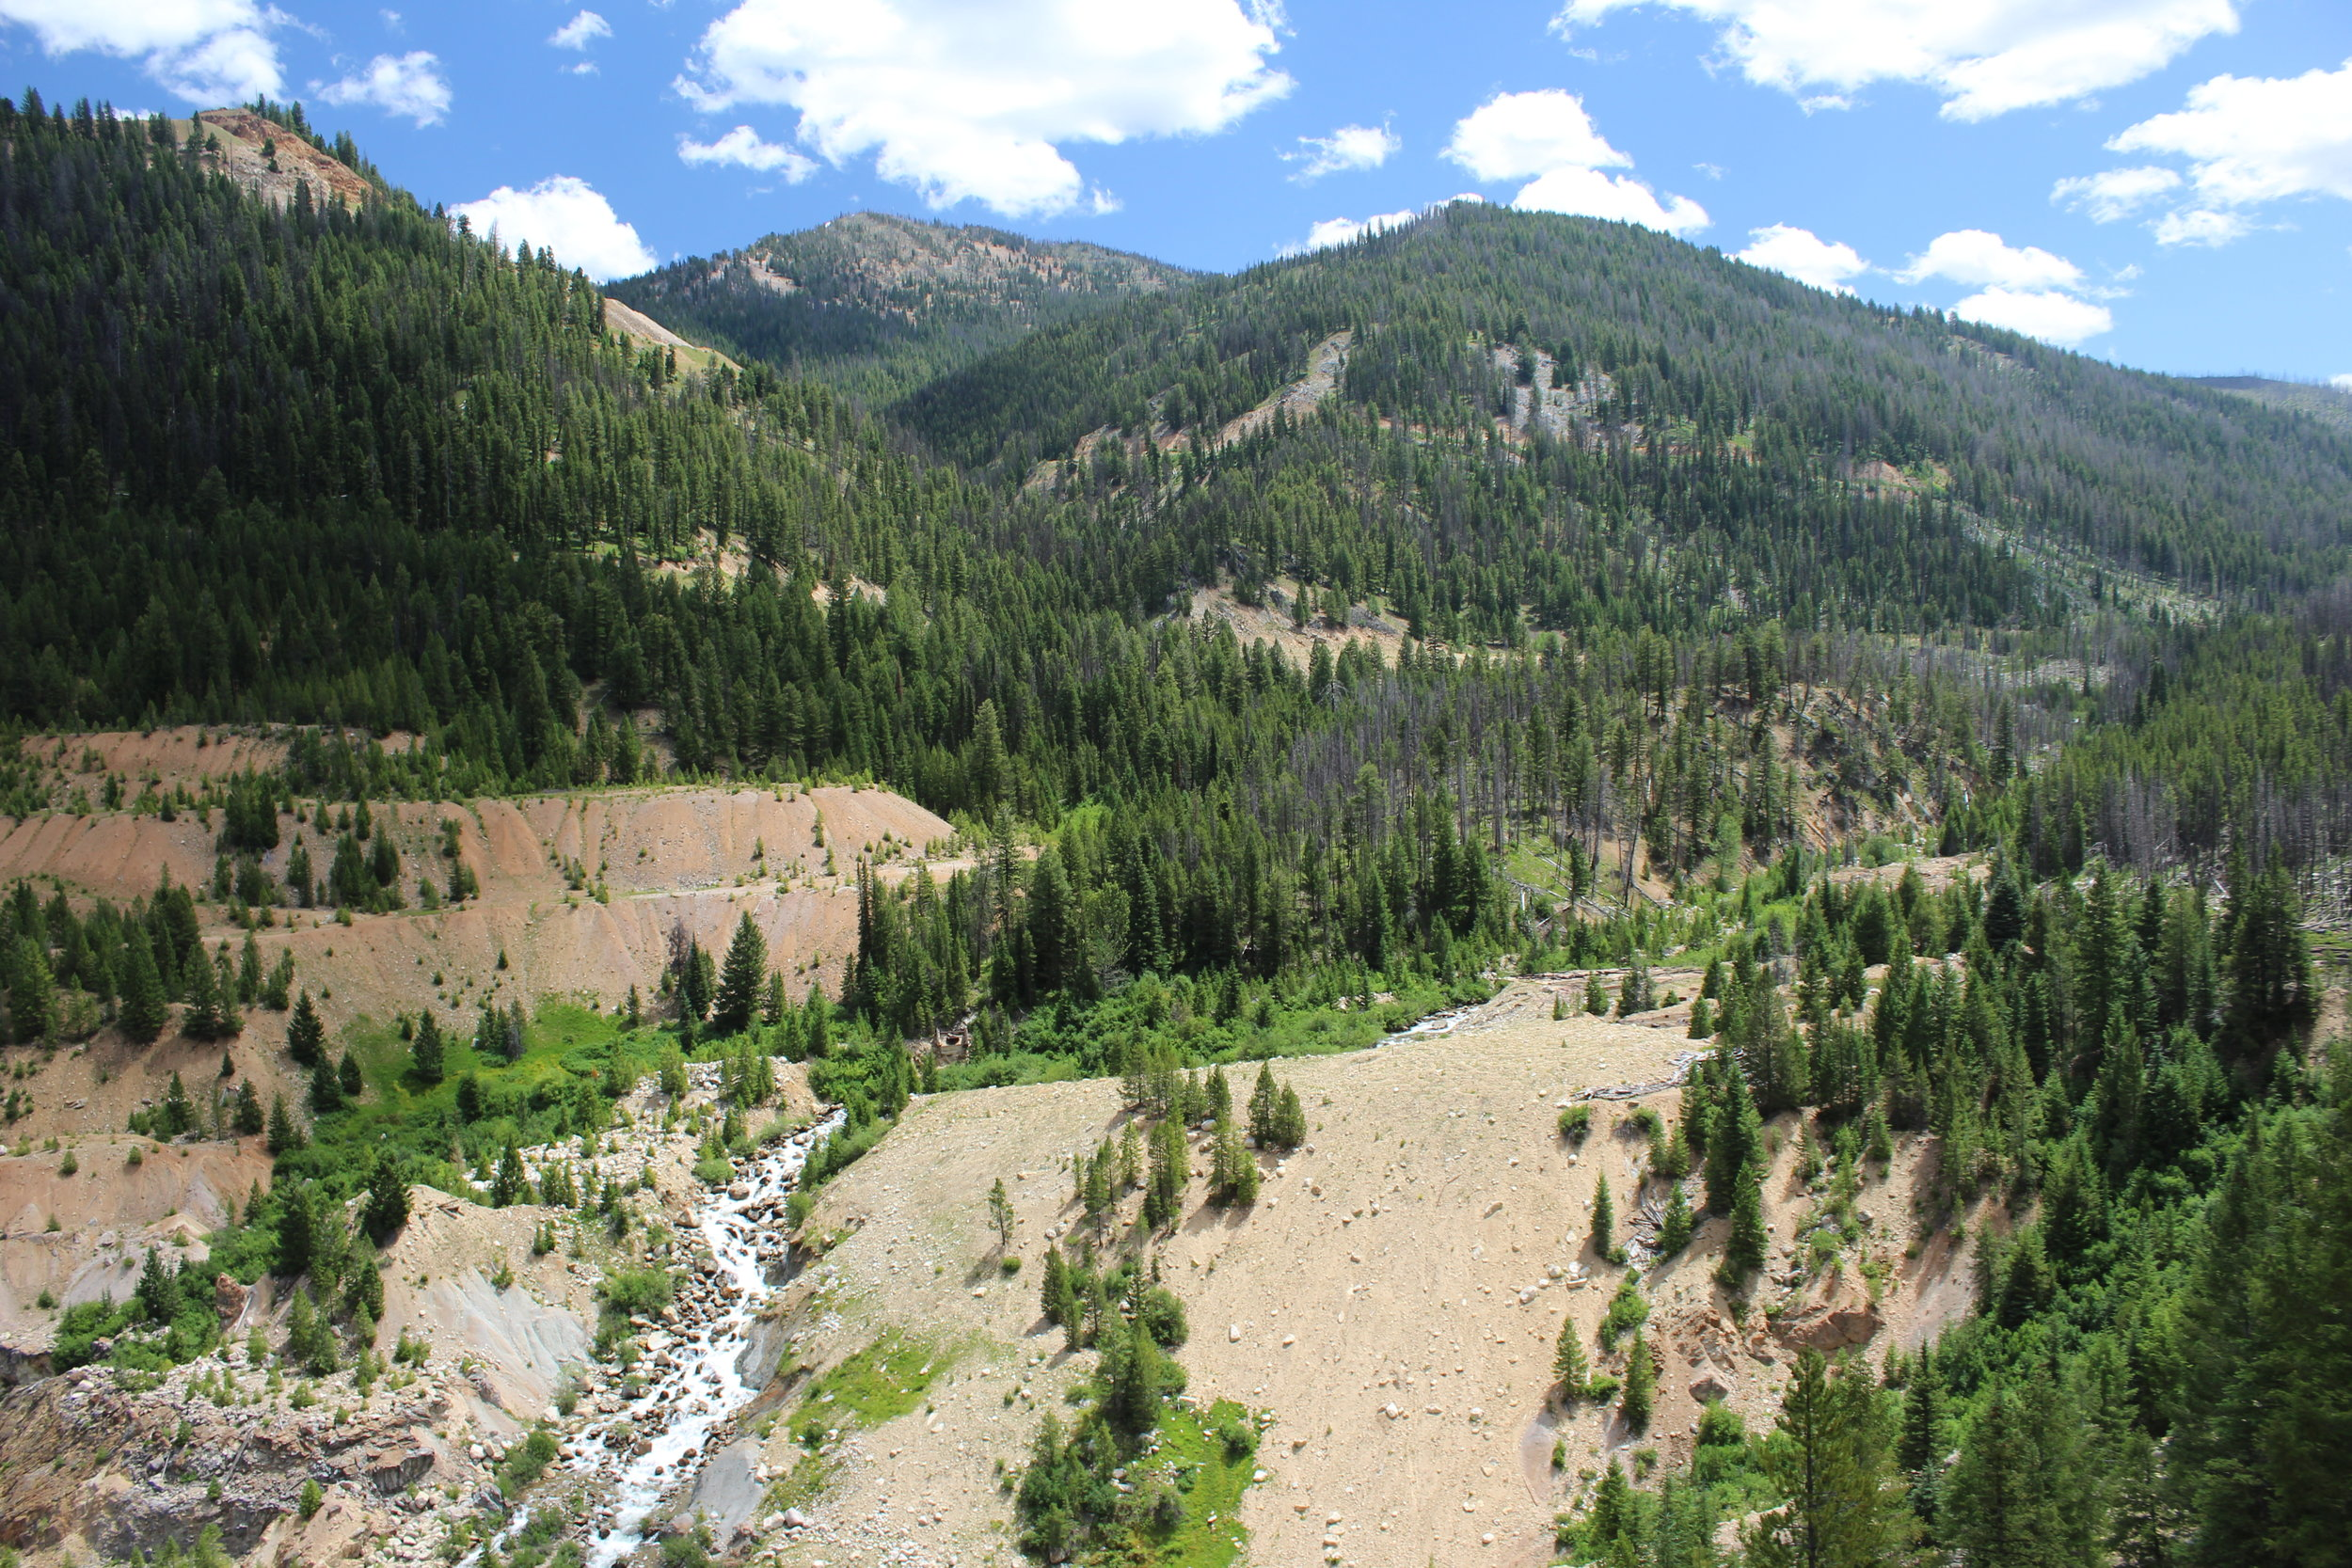 Mountains around Yellow Pine Pit